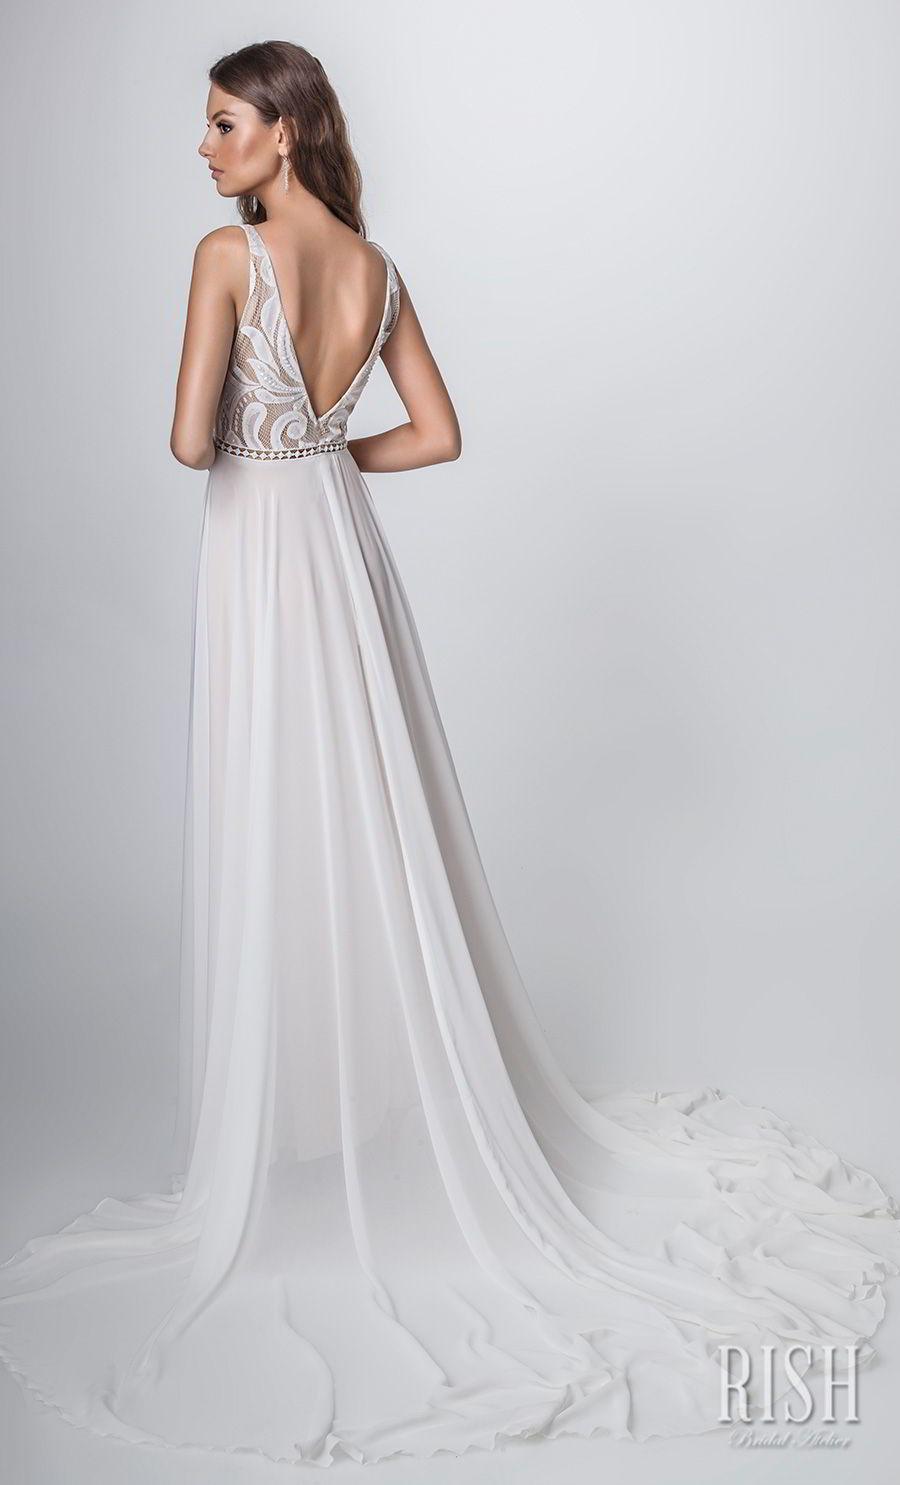 rish bridal sun dance 2018 sleeveless deep v neck heavily embellished bodice romantic glamorous soft a  line wedding dress v back chapel train (venice) bv